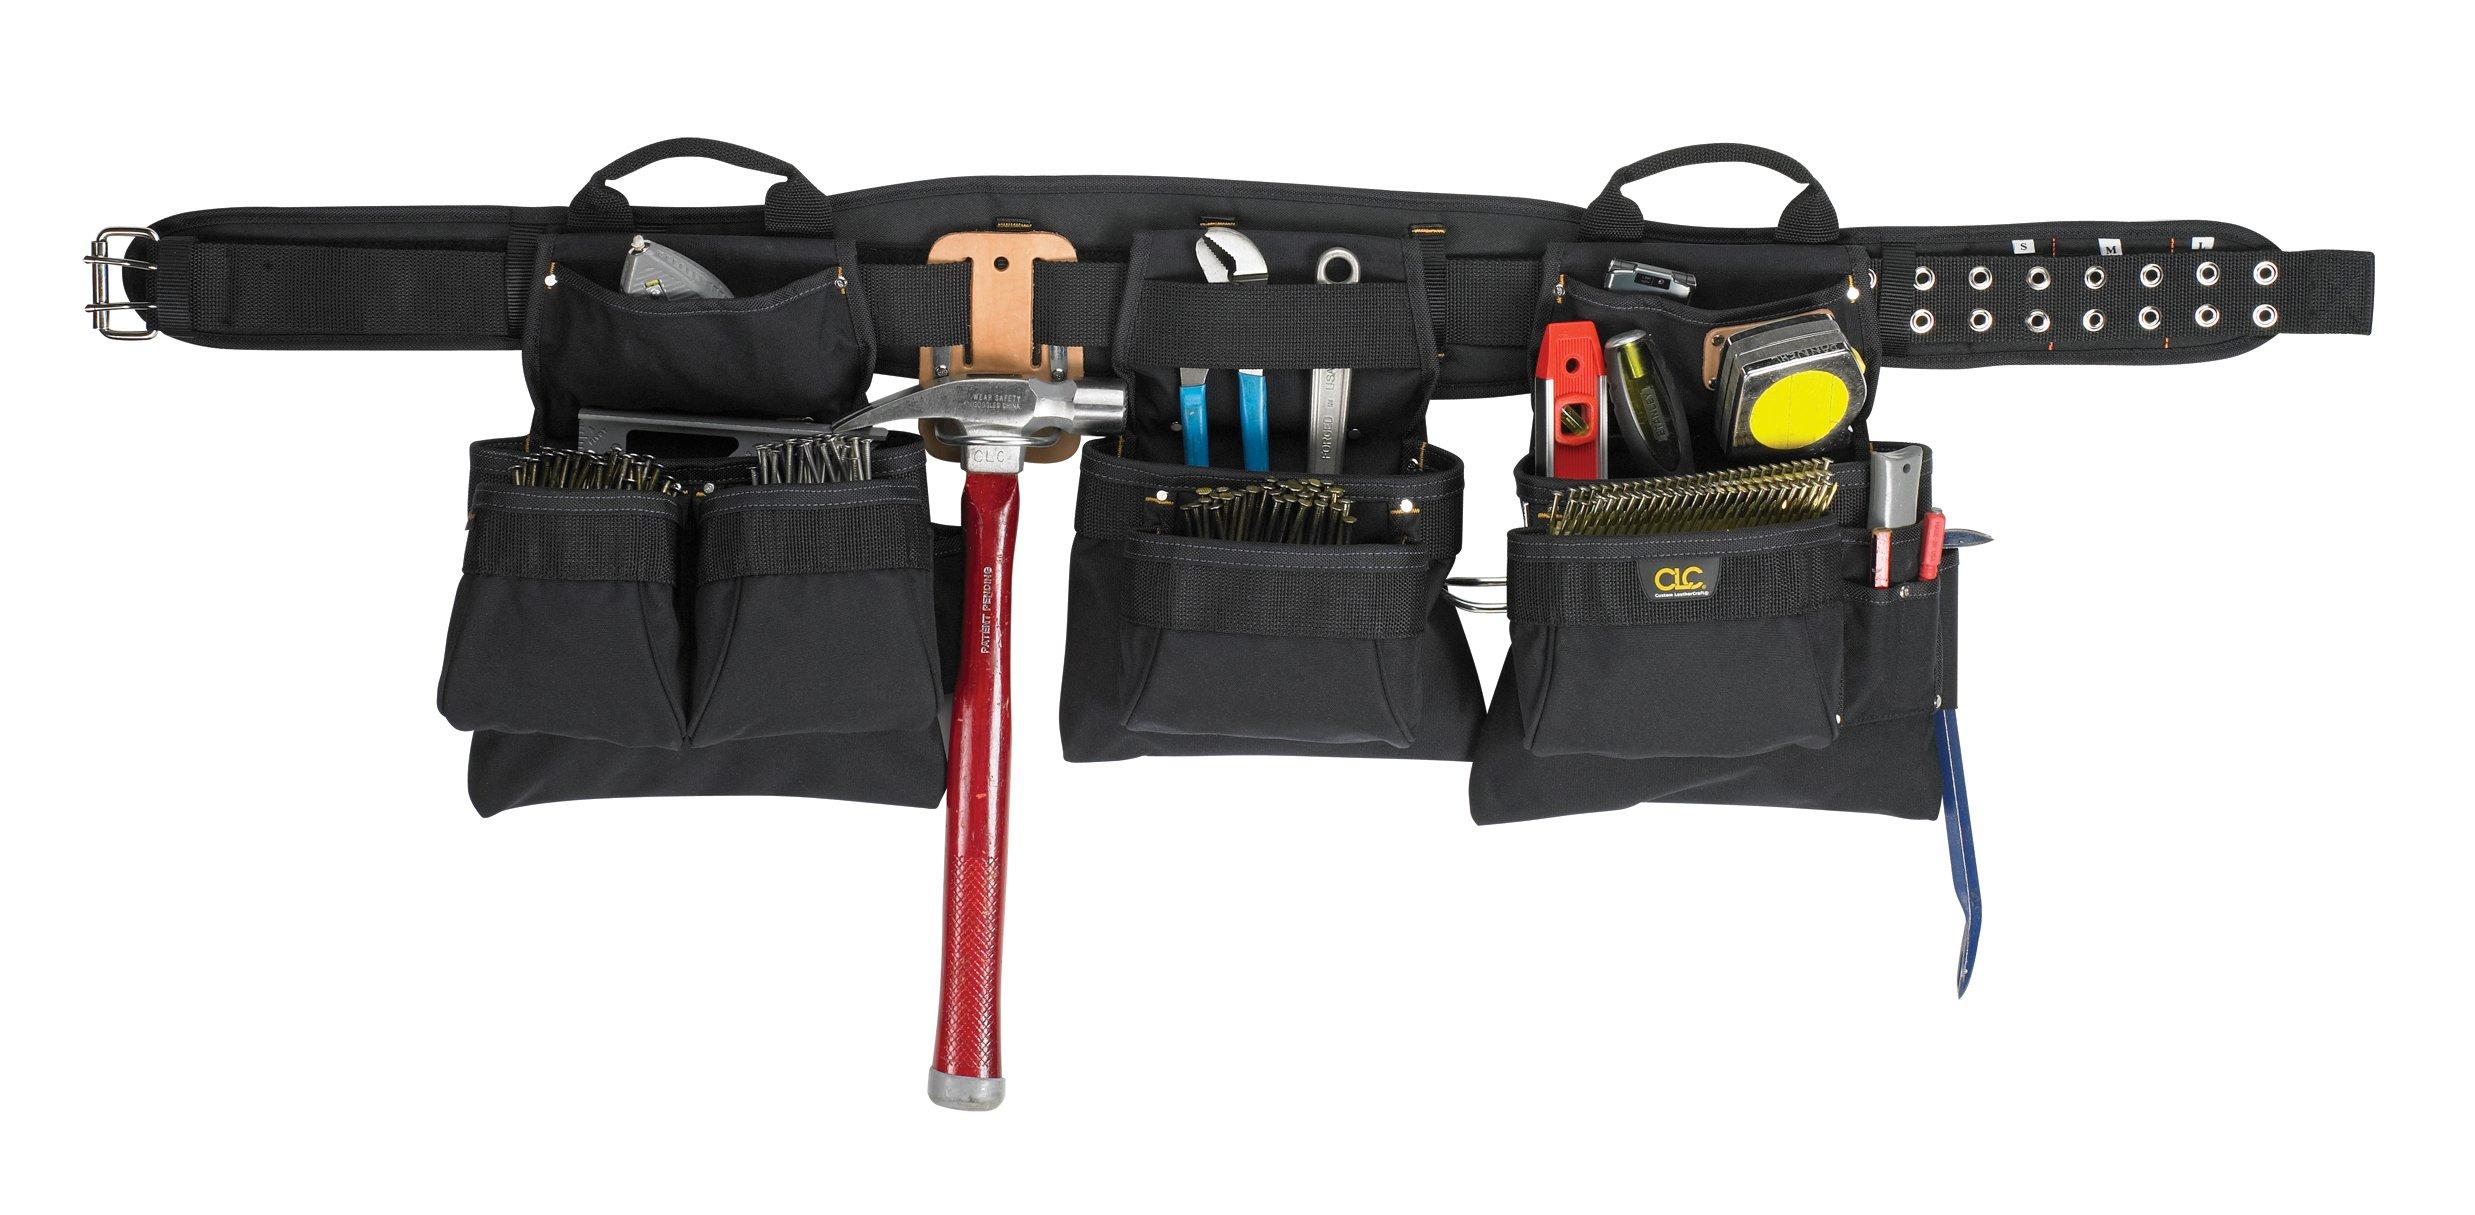 CLC Custom Leathercraft 5605 Professional Carpenters Combo Tool Belt, Black, 18 Pocket by Custom Leathercraft